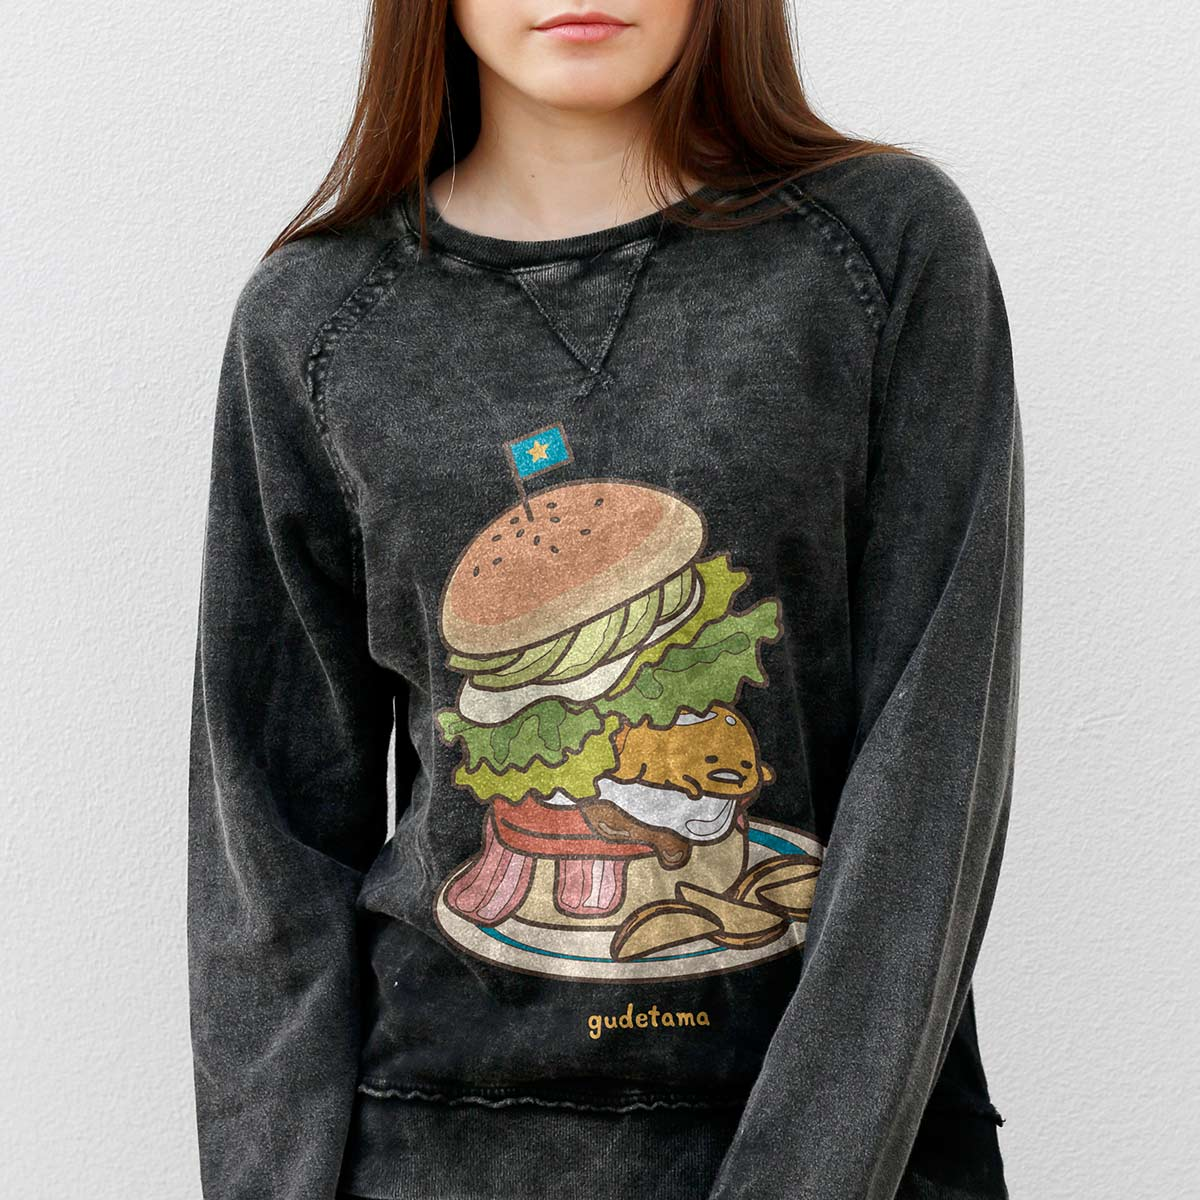 Moletinho Marmorizado Gudetama Sandwich